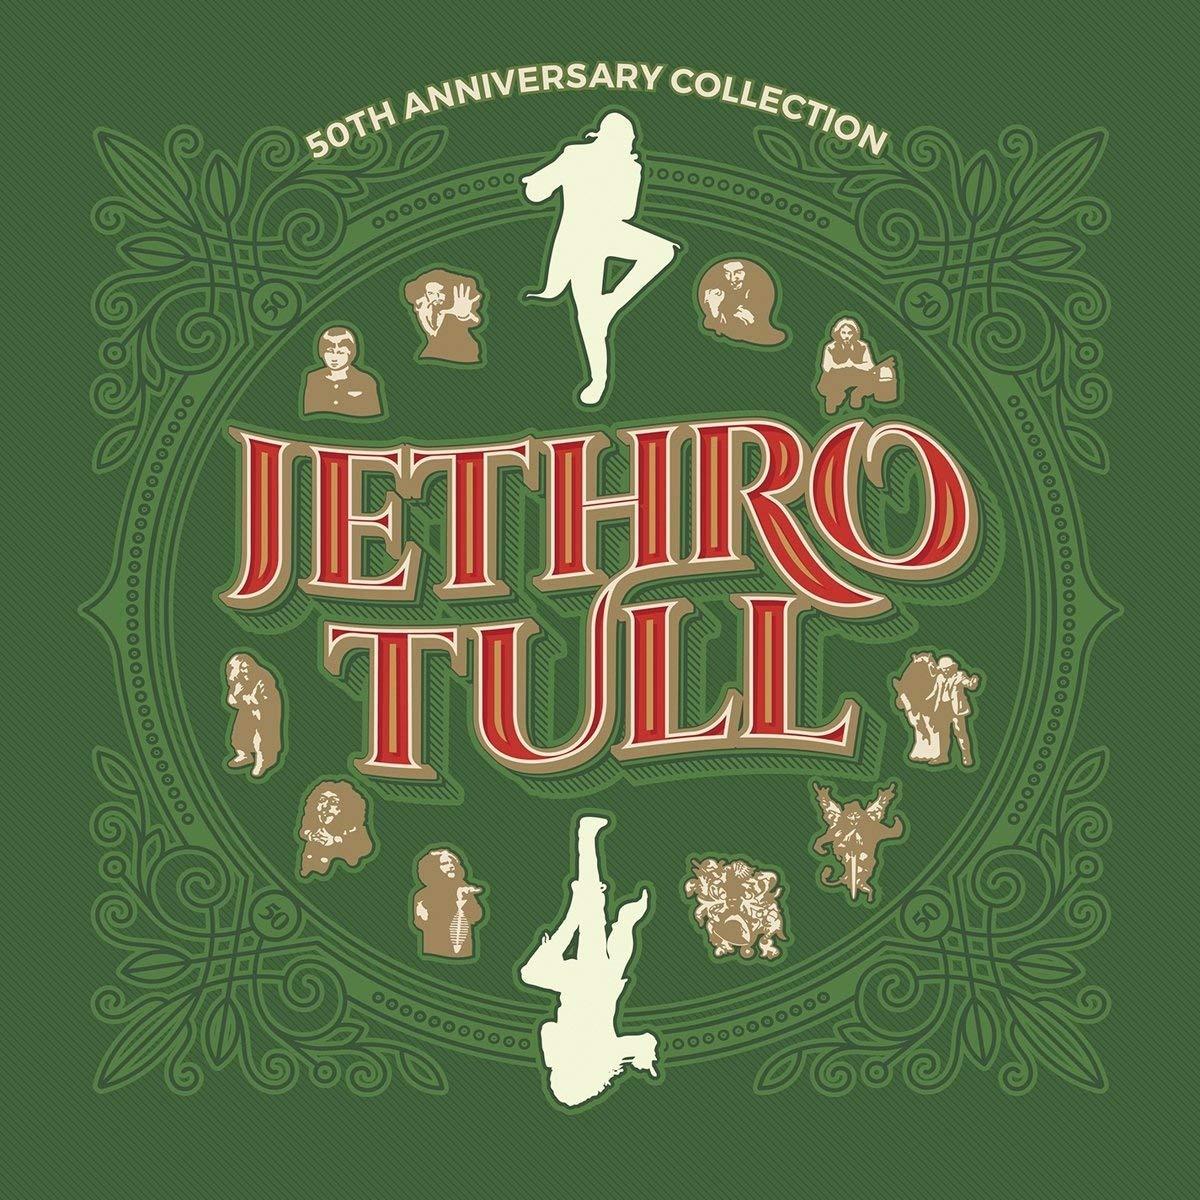 Jethro Tull Tull. 50th Anniversary Collection (LP)